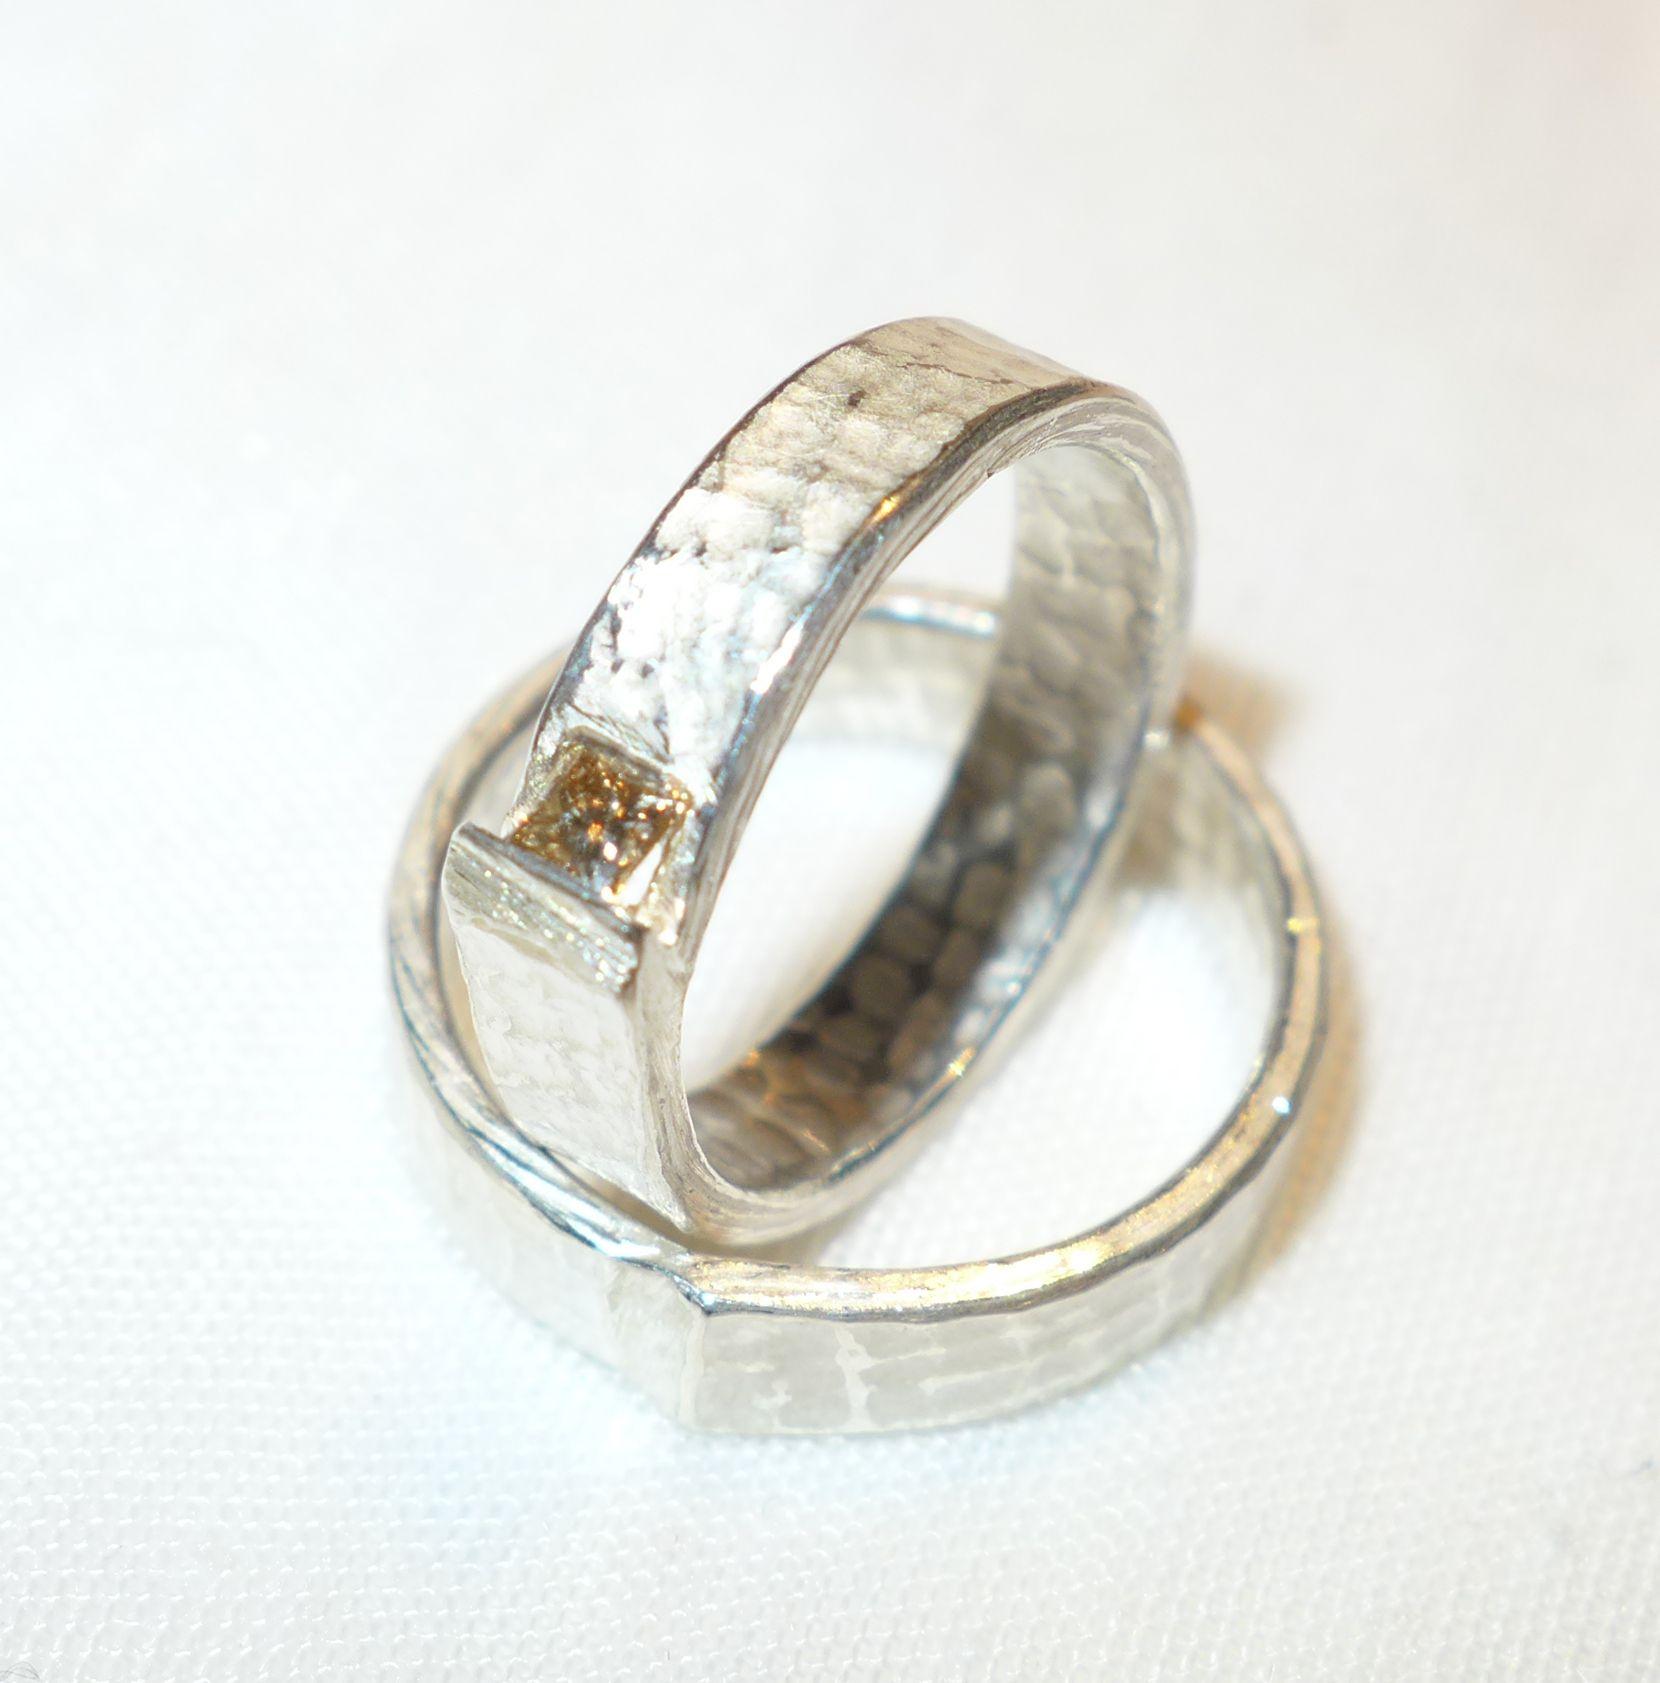 Customized wedding bands with diamond square Custom wedding bands